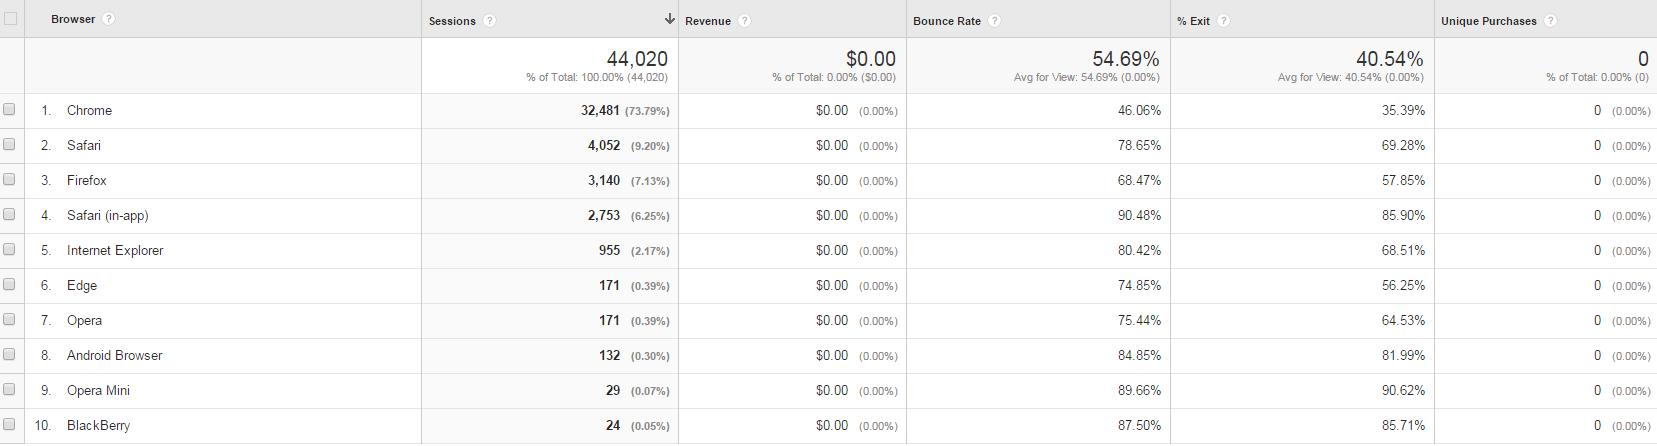 Google Analytics Custom Reports Browser Report